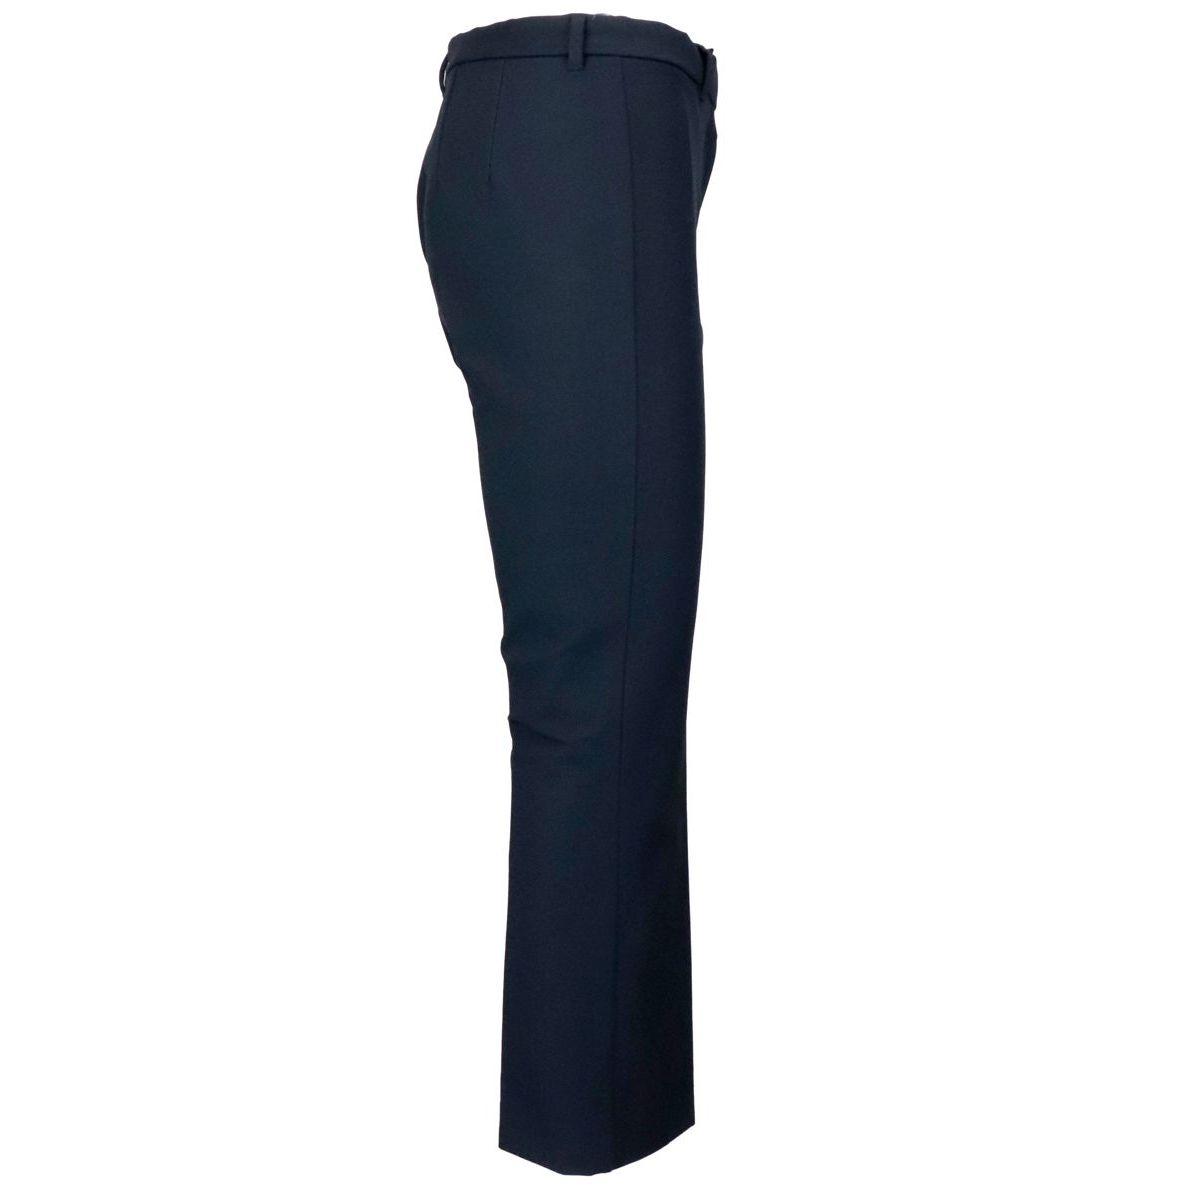 Men's trumpet trousers in cotton Navy S MAX MARA